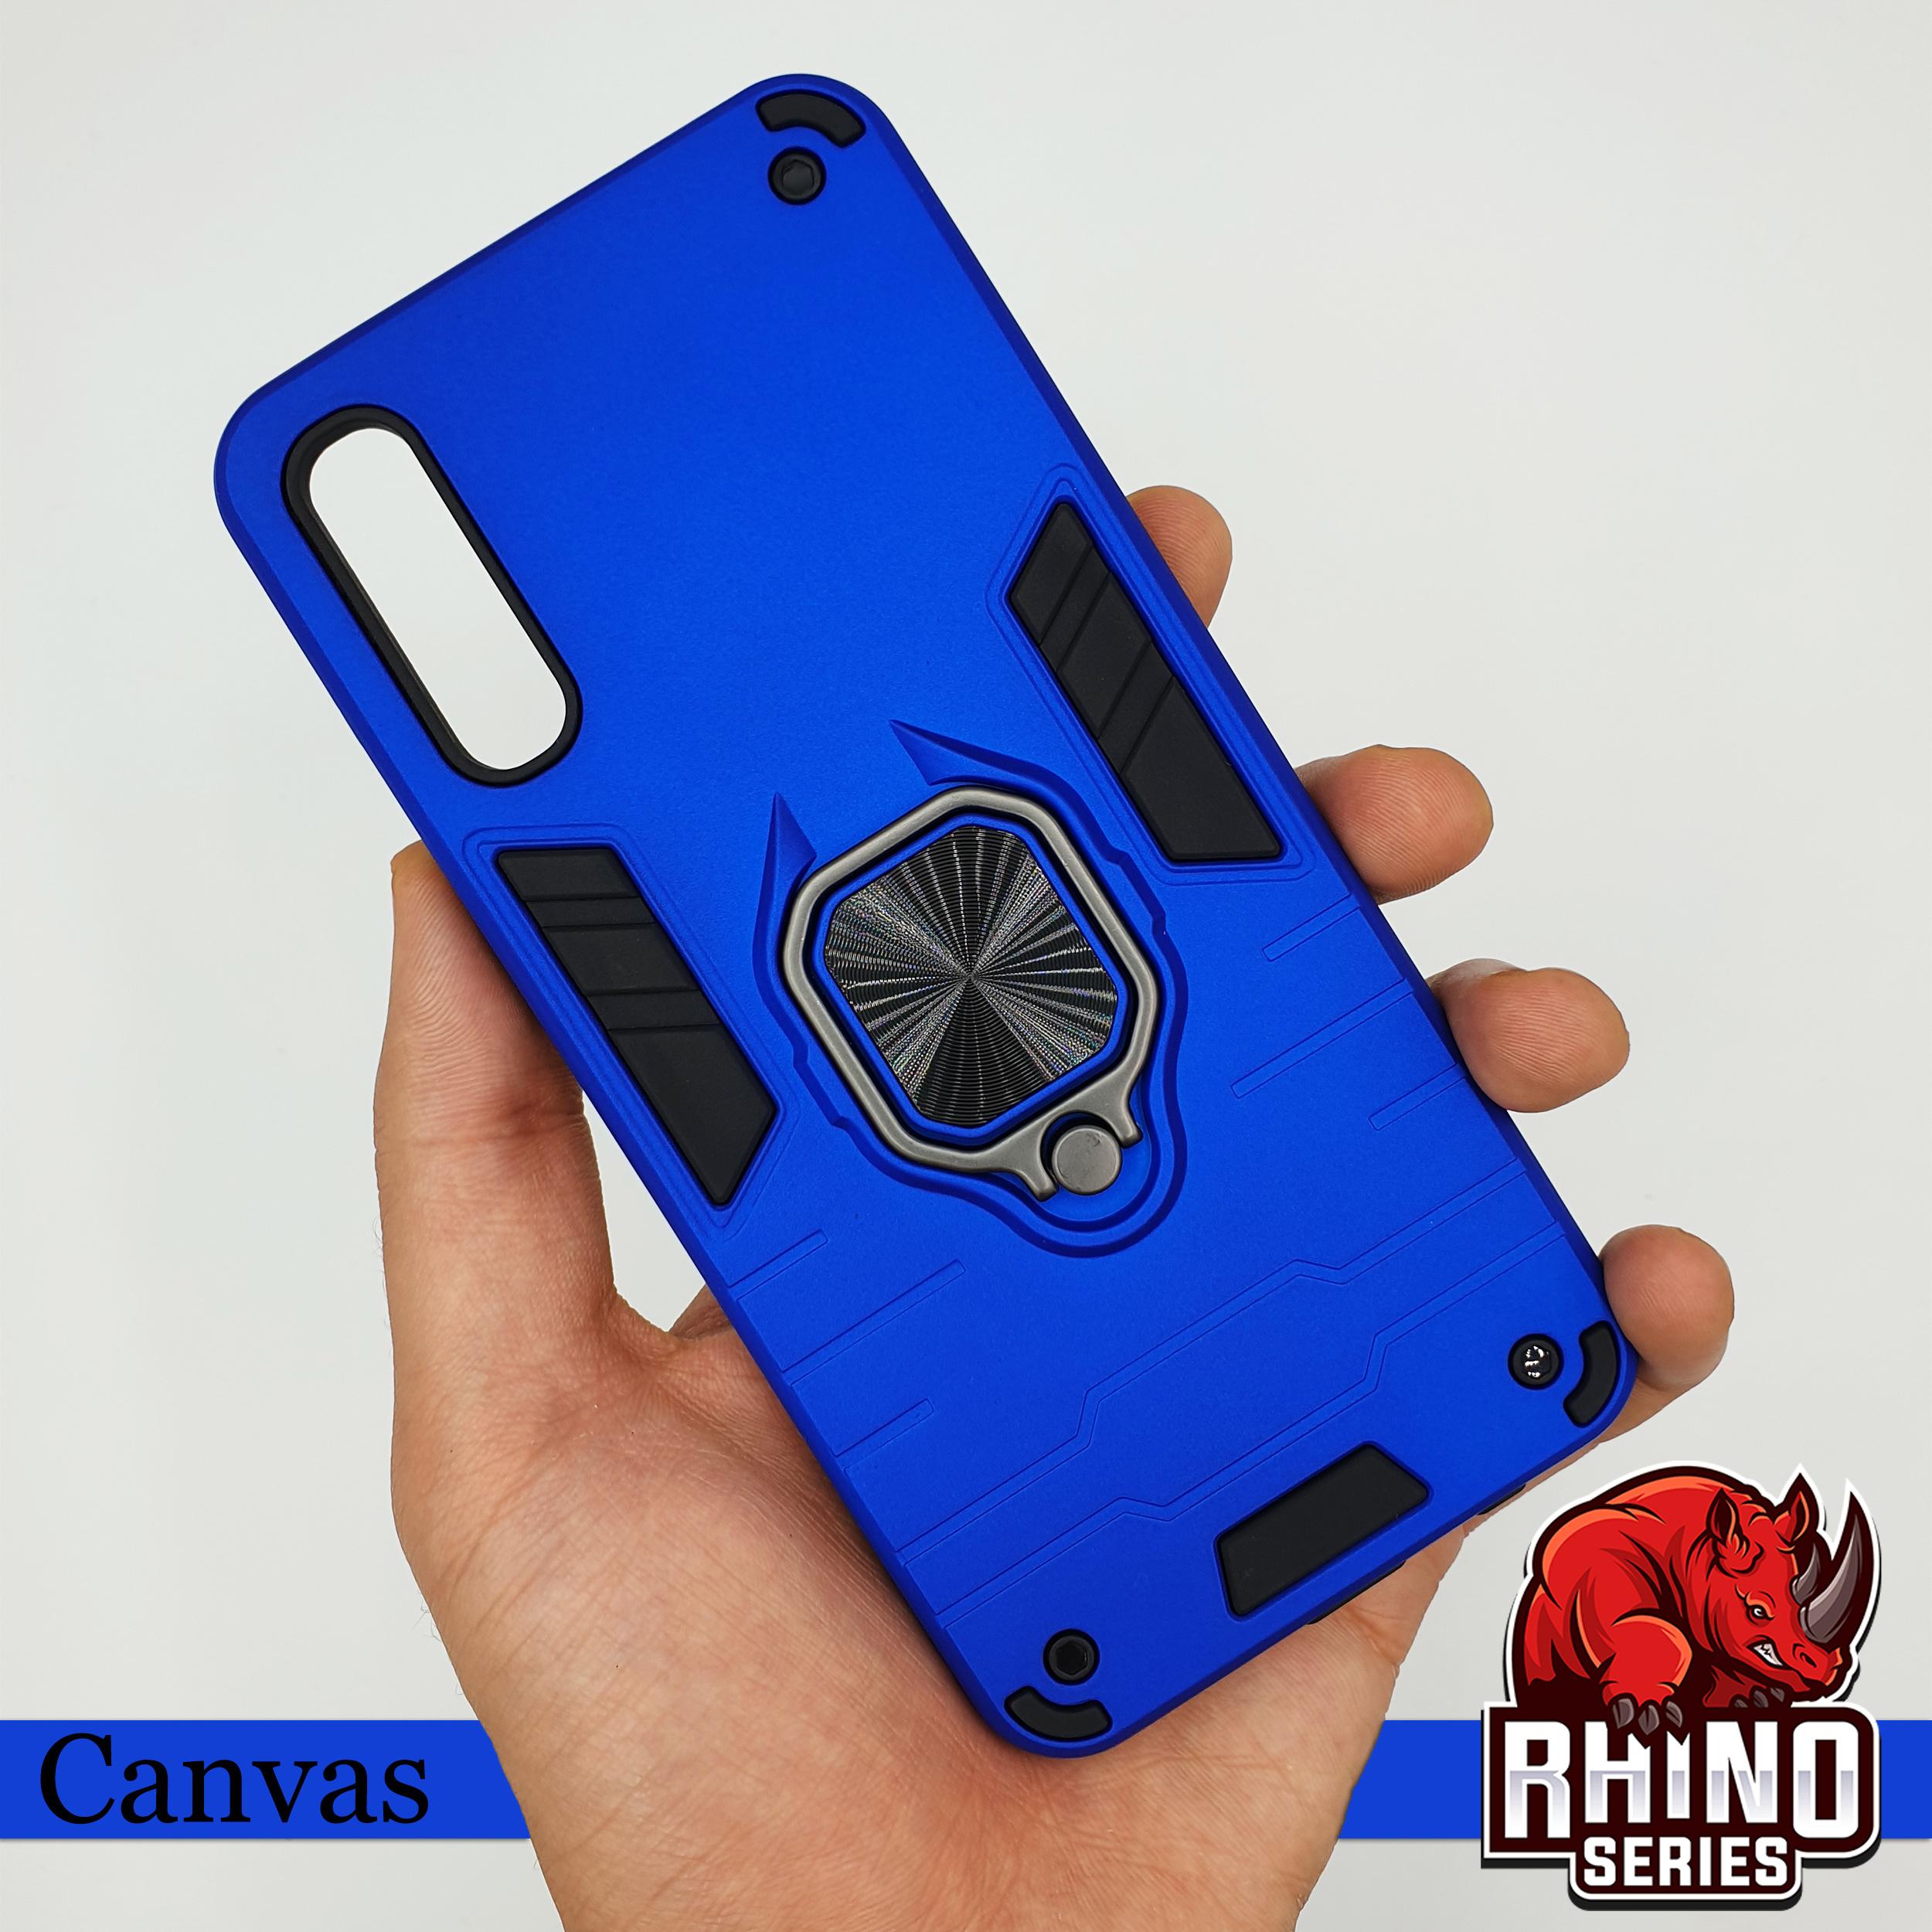 کاور کانواس مدل RHINO SERIES مناسب برای گوشی موبایل سامسونگ Galaxy A50s/A30s/A50 main 1 3